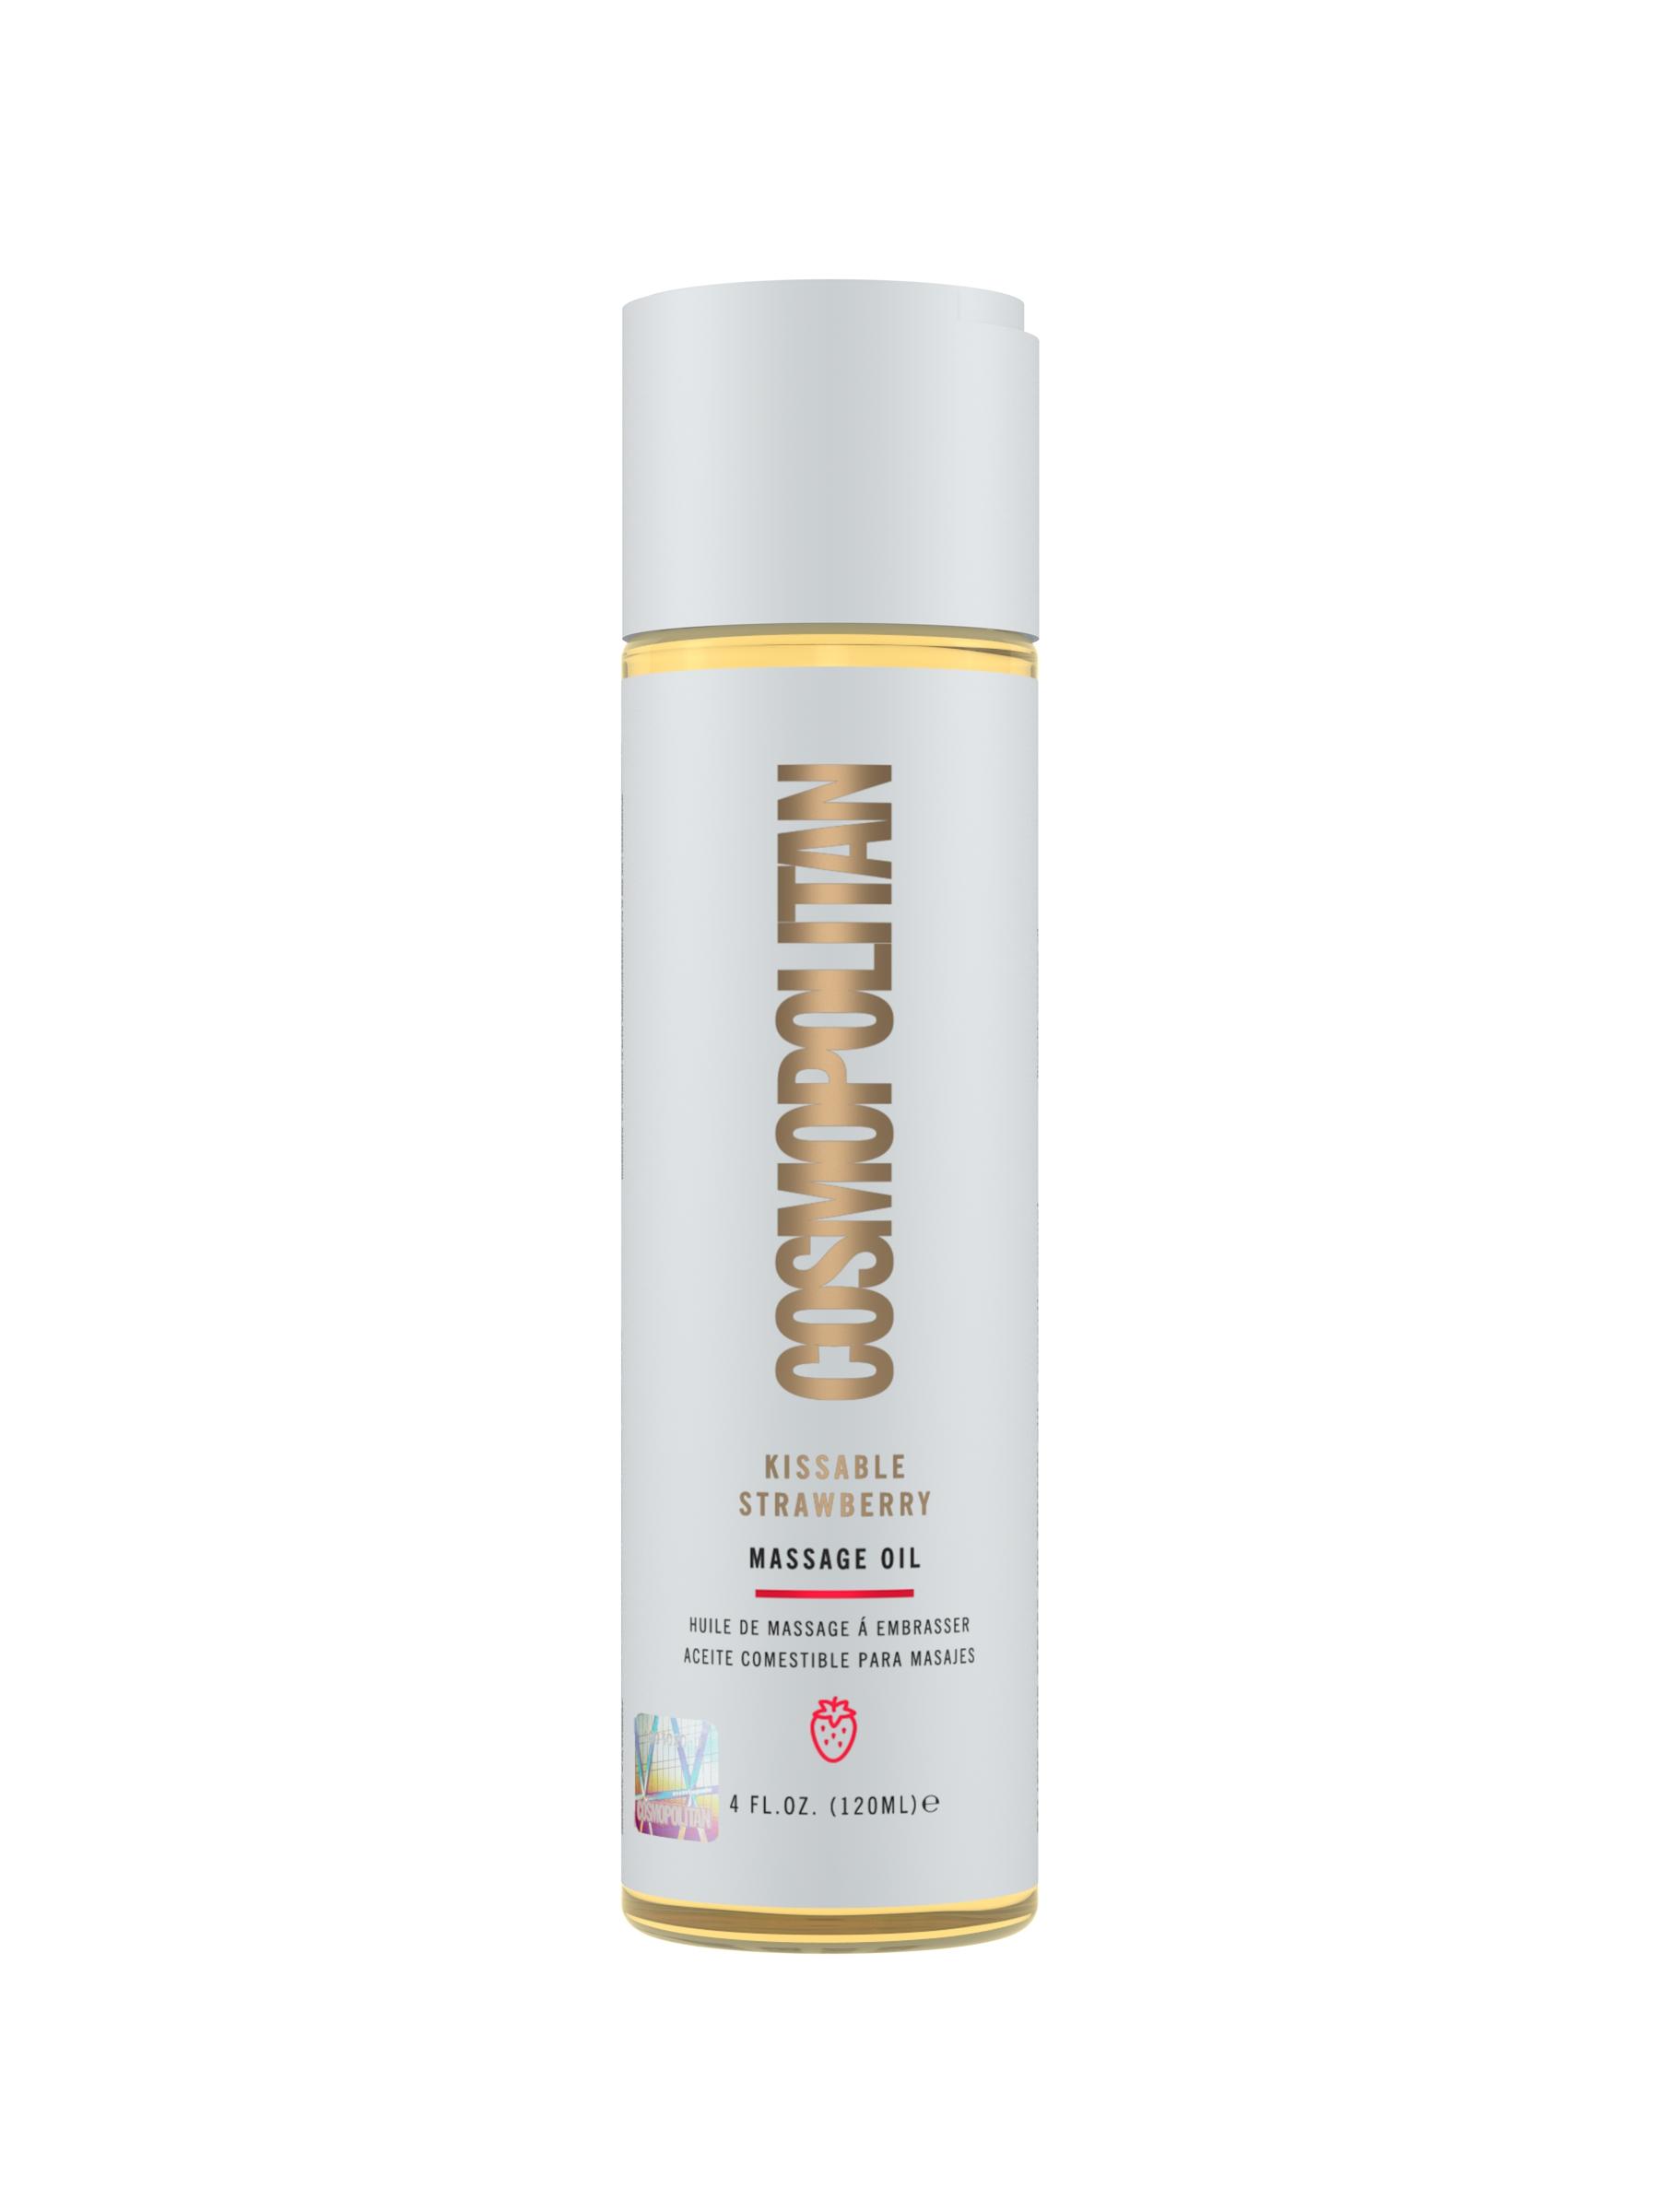 COSMO Kissable Strawberry Massage Oil -